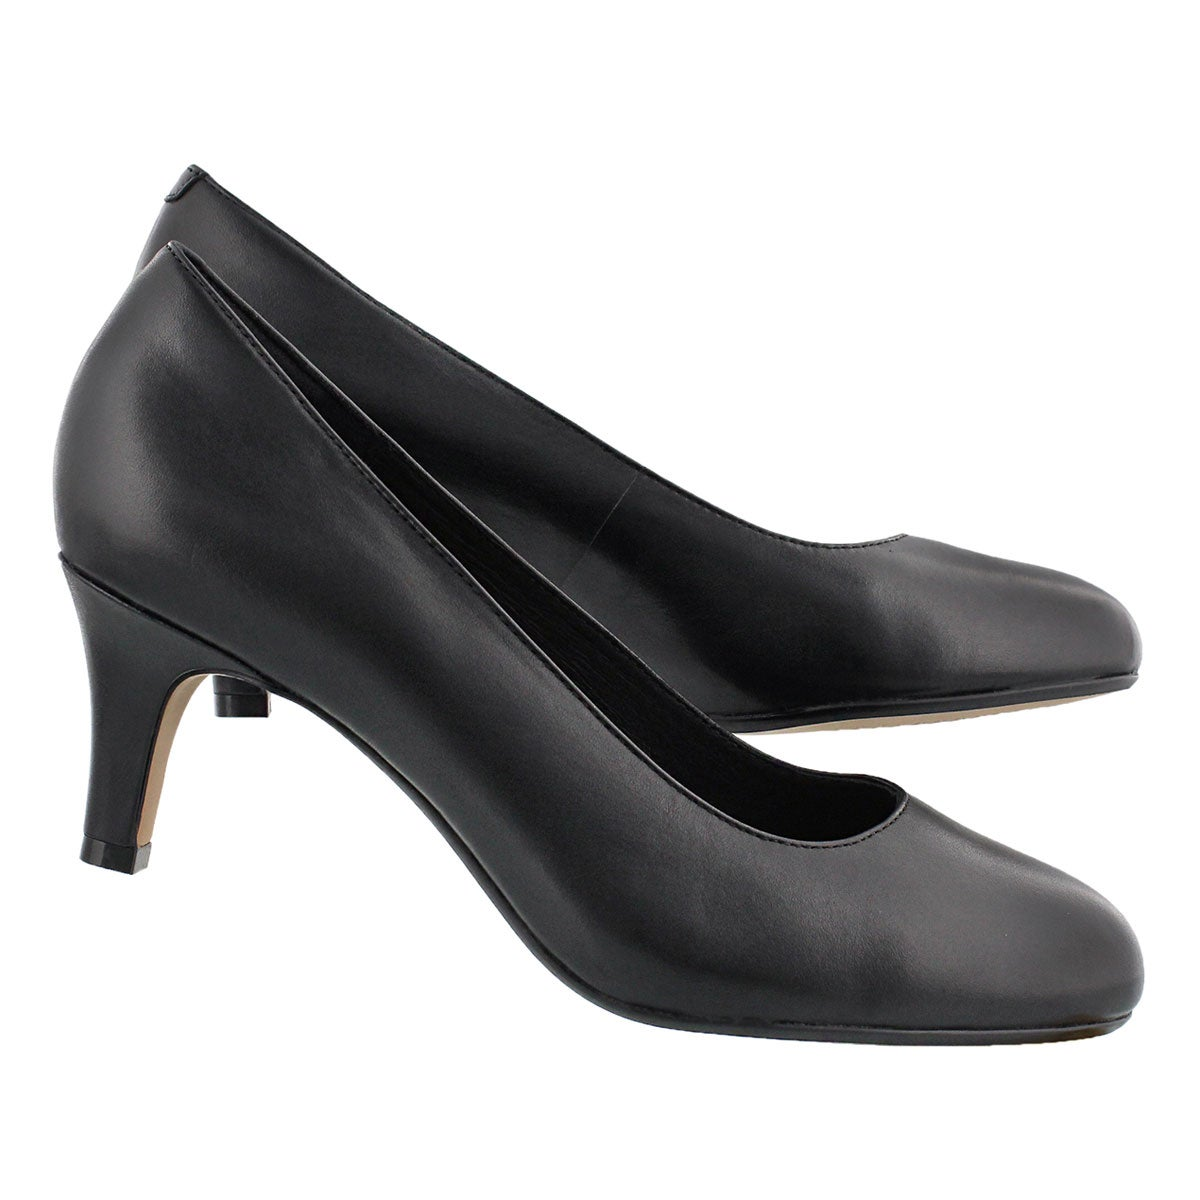 Lds Heavenly Heart black dress heel